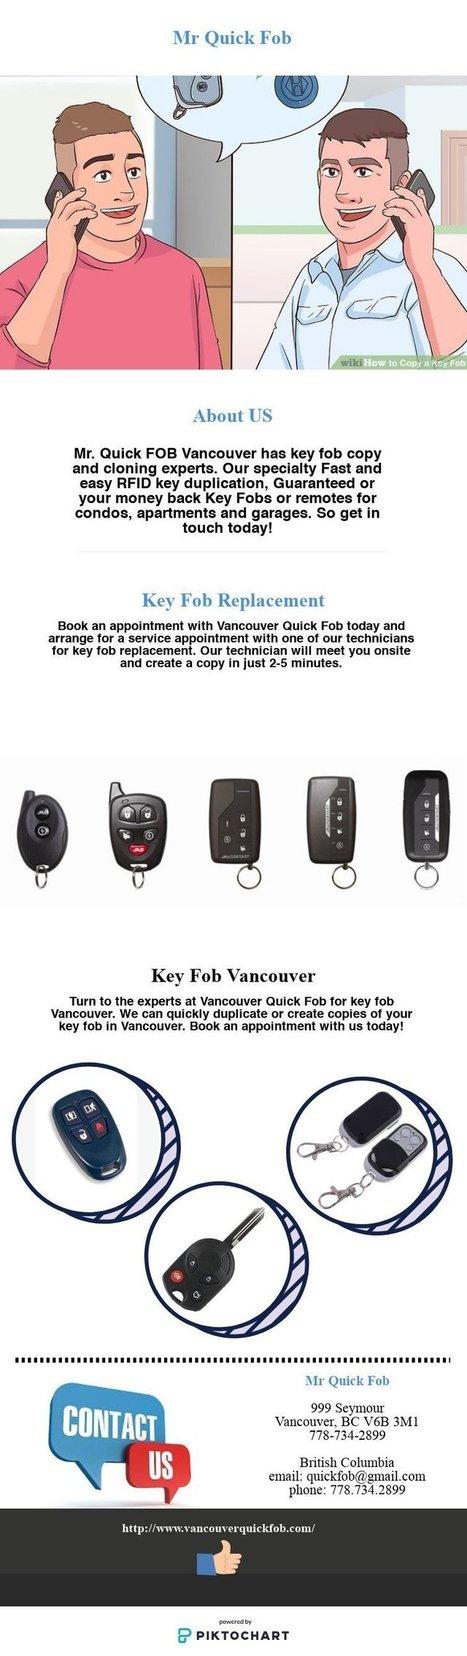 Vancouver Key Fob Copy | Scoop it